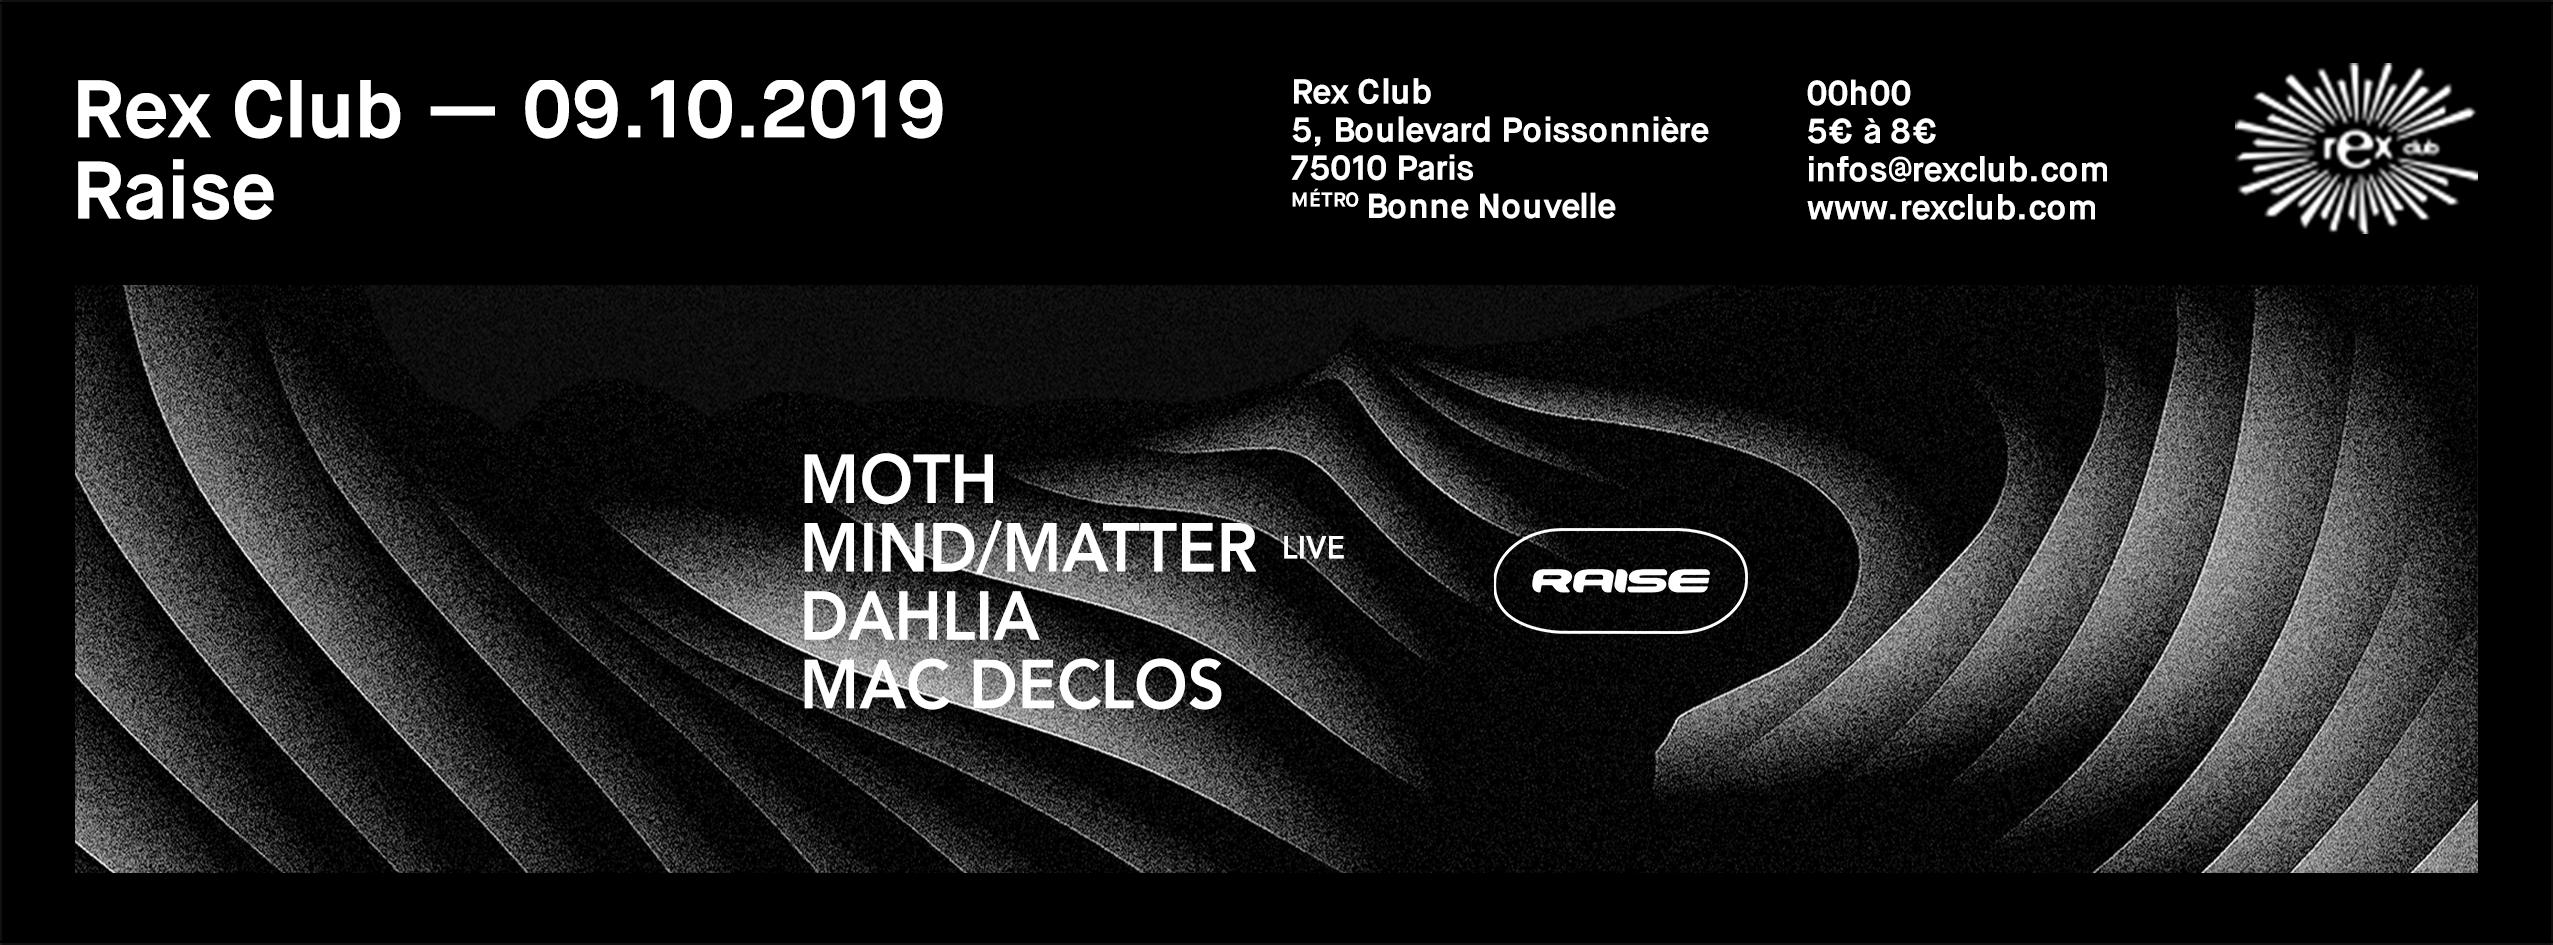 Raise: Moth, Mind/Mater Live, Dahlia, Mac Declos